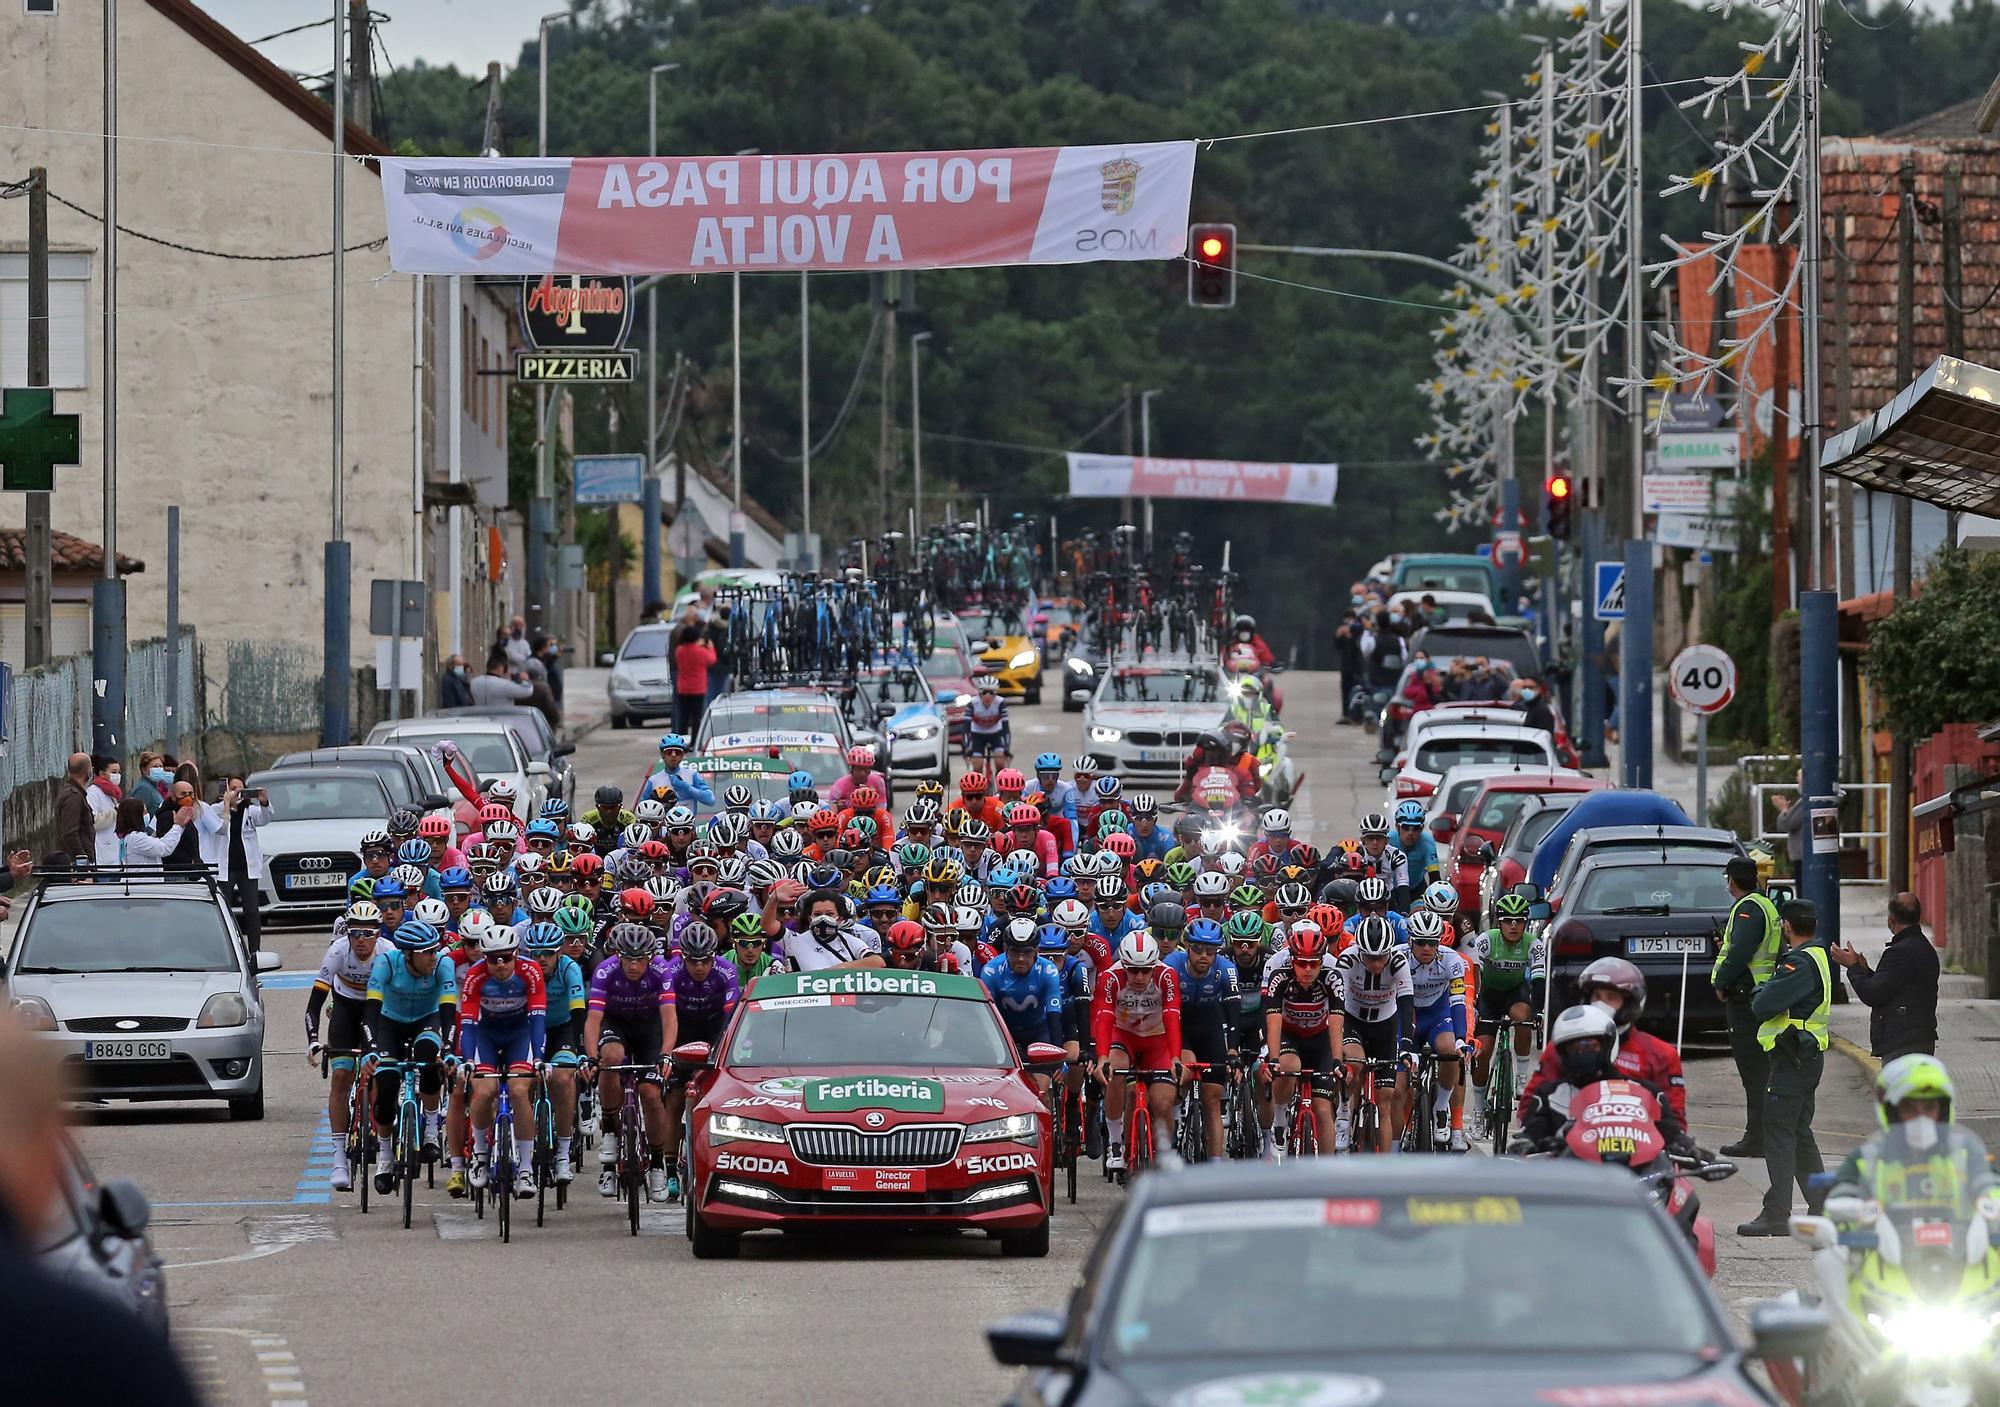 15ª etapa de la Vuelta Ciclista a España, a su paso por Mos.